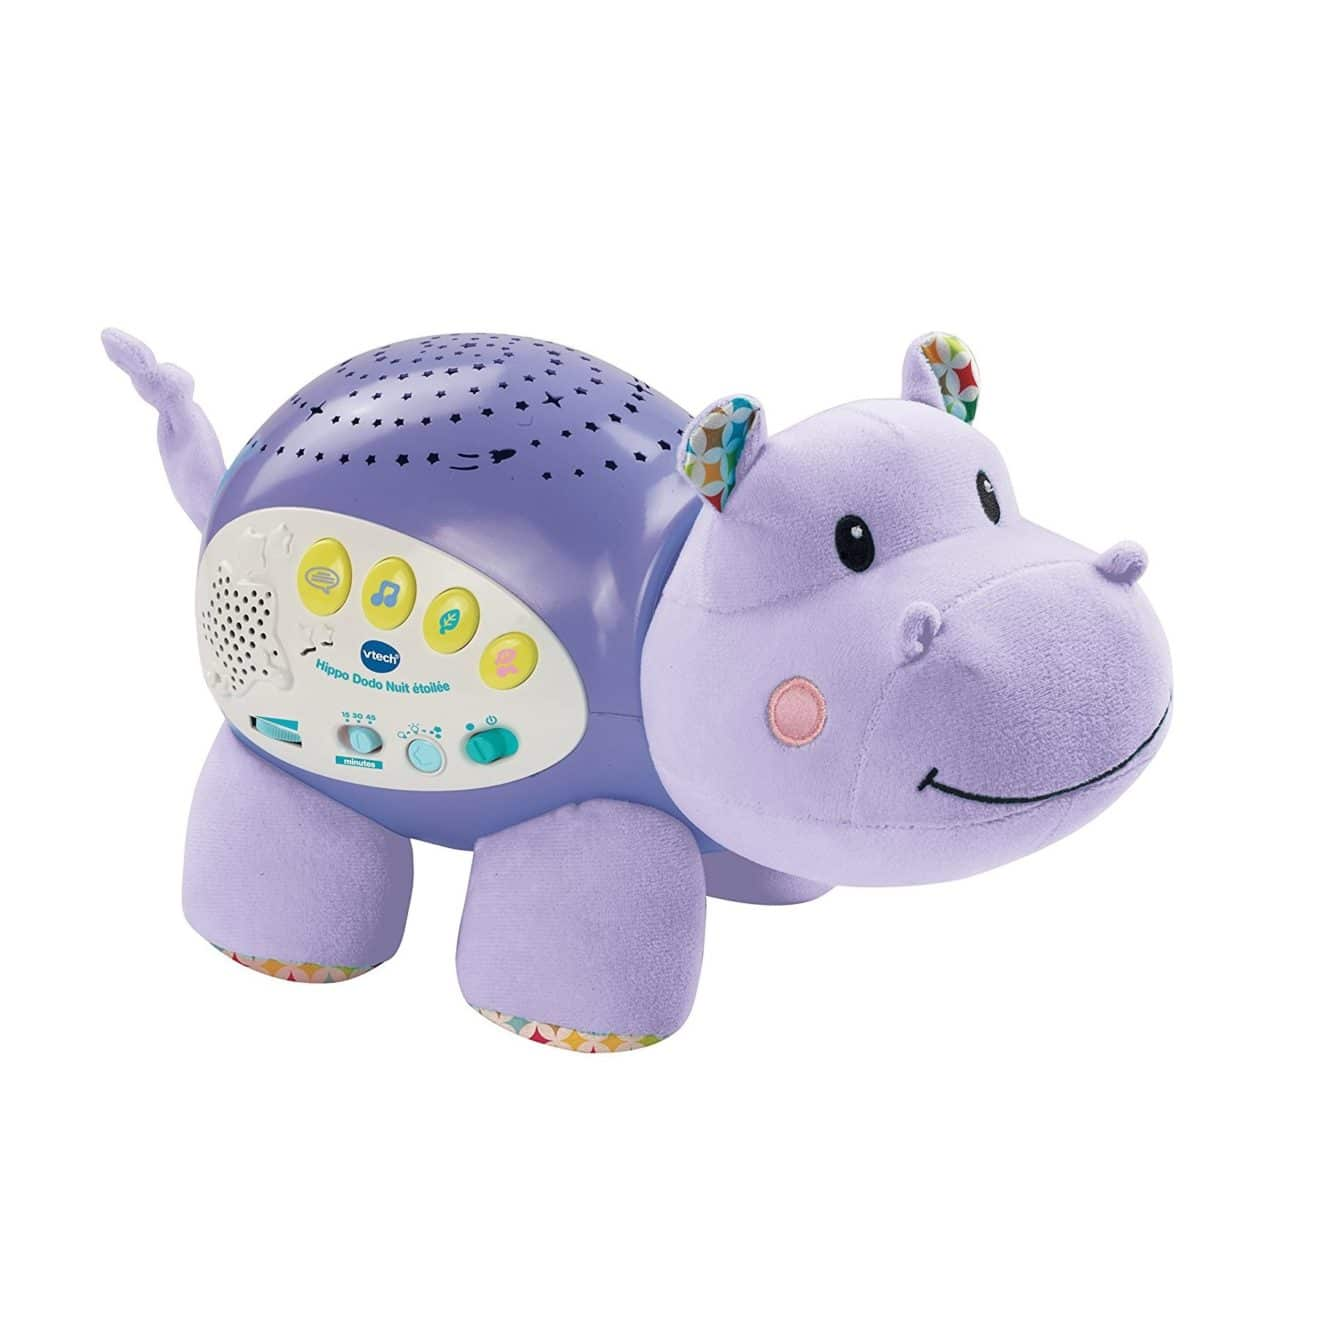 veilleuse-projecteur-etoiles-vtech-hippo-dodo-nuit-etoilee